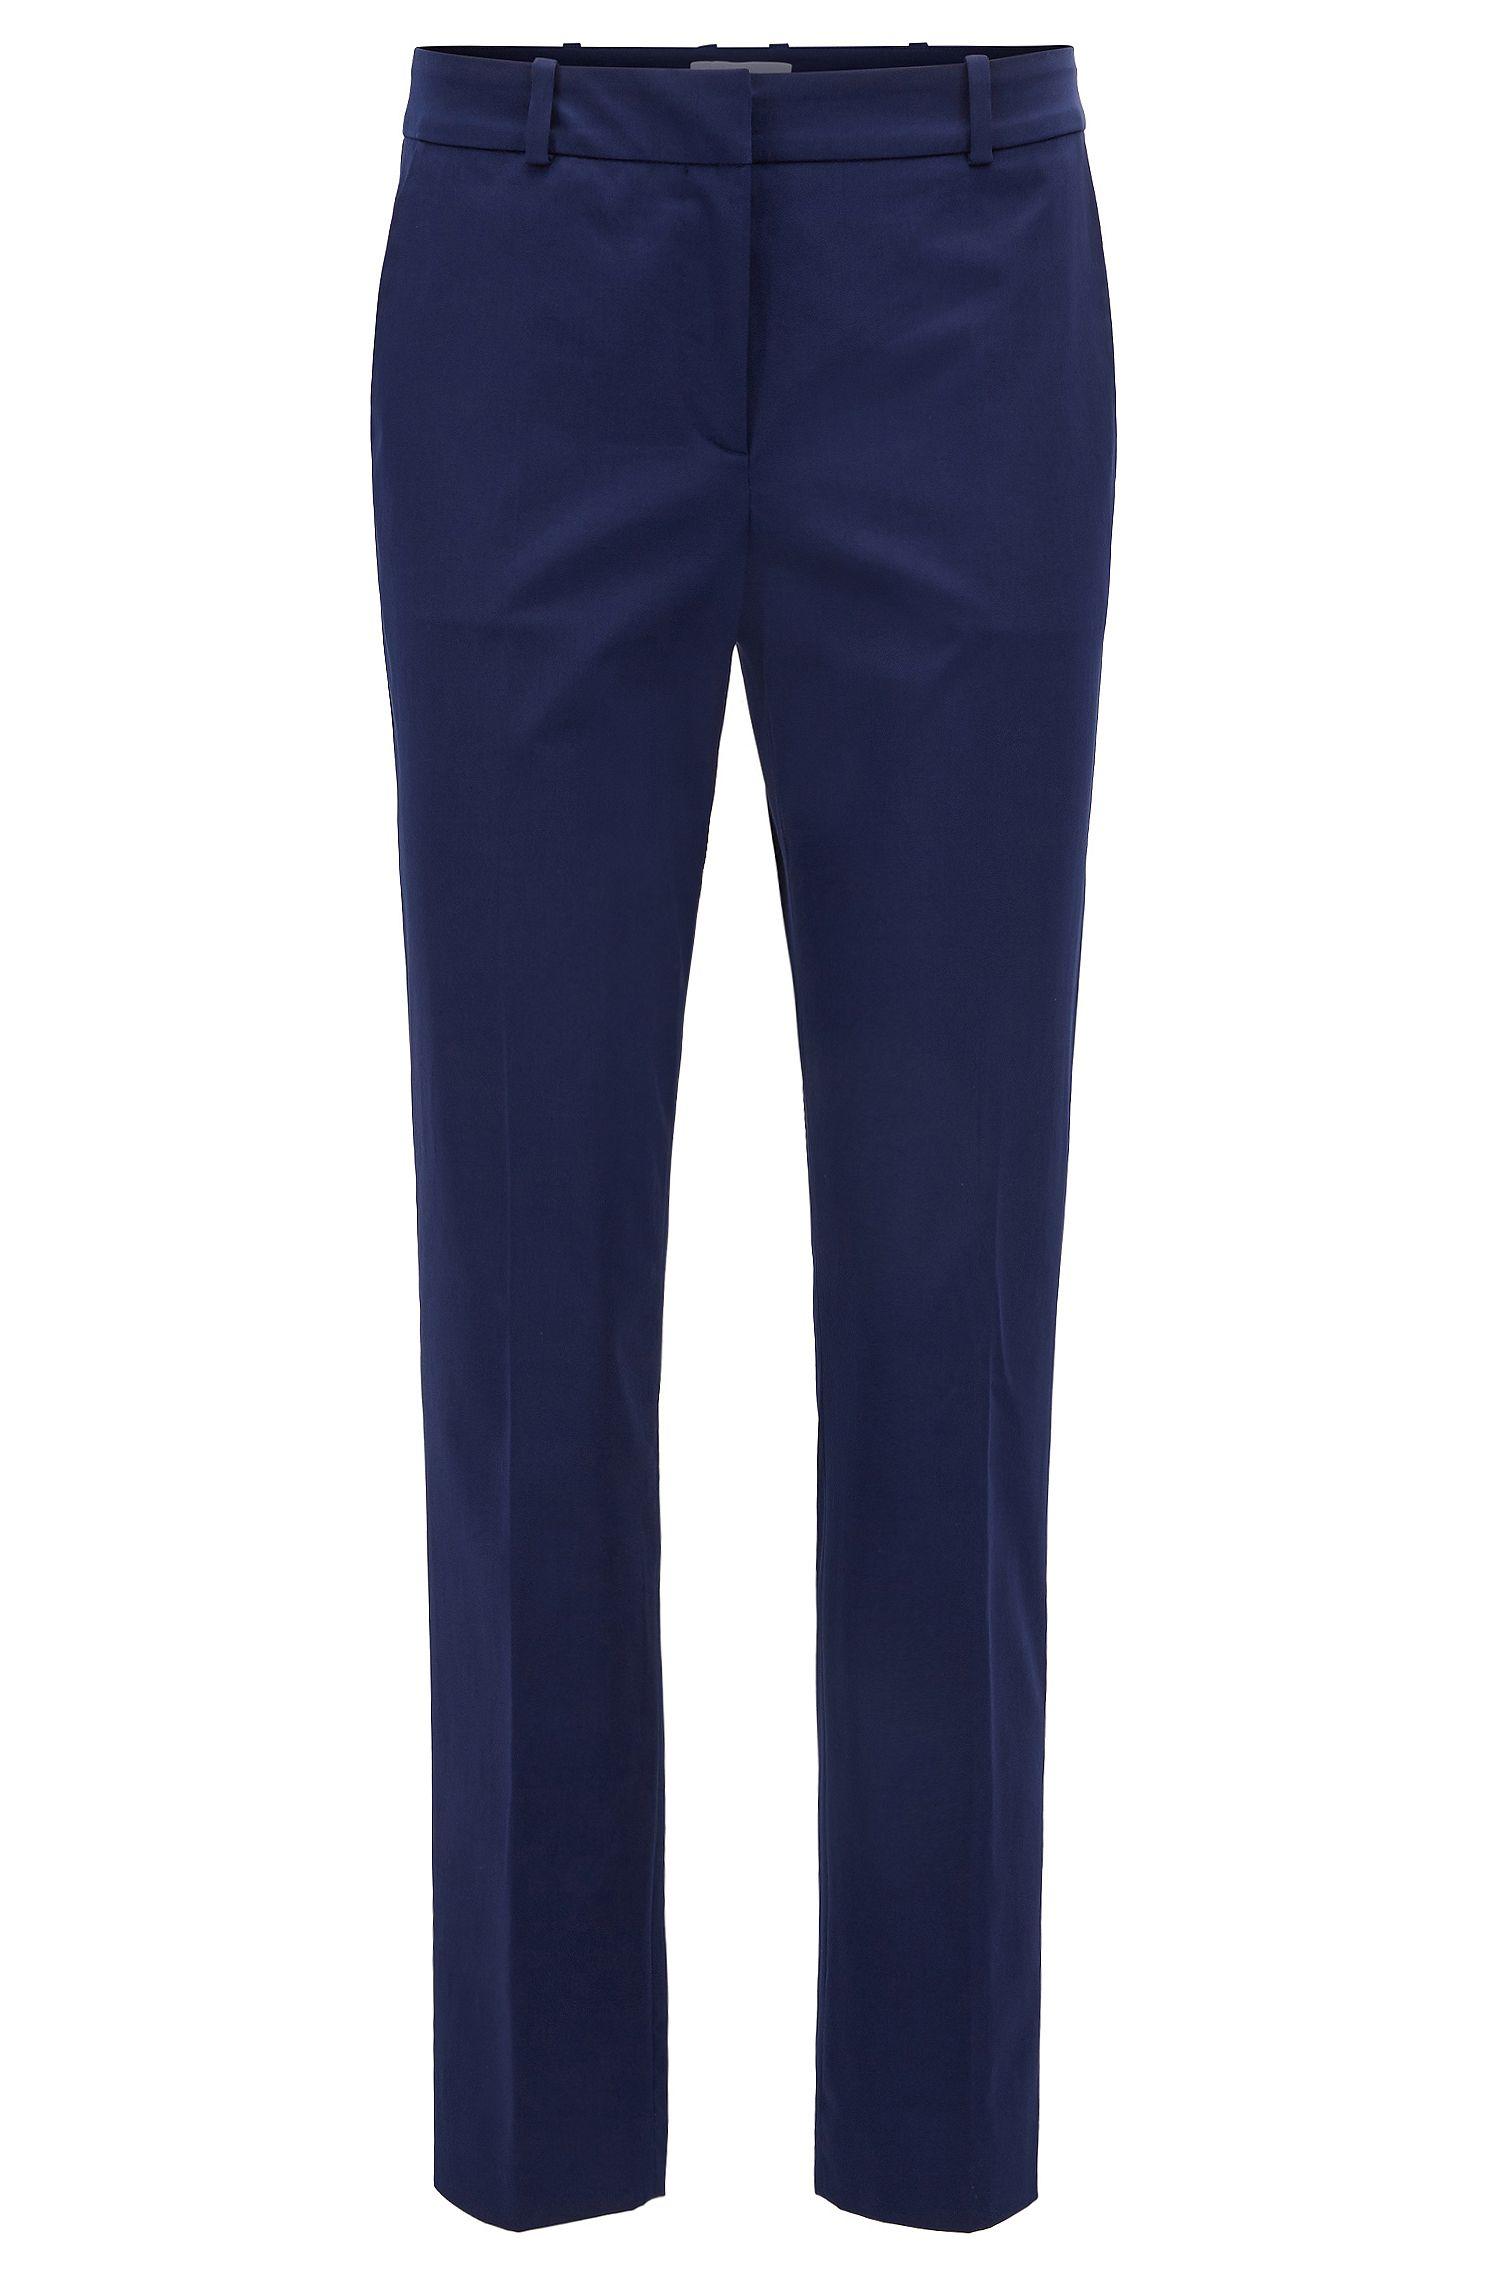 Pantalones tobilleros relaxed fit en algodón elástico